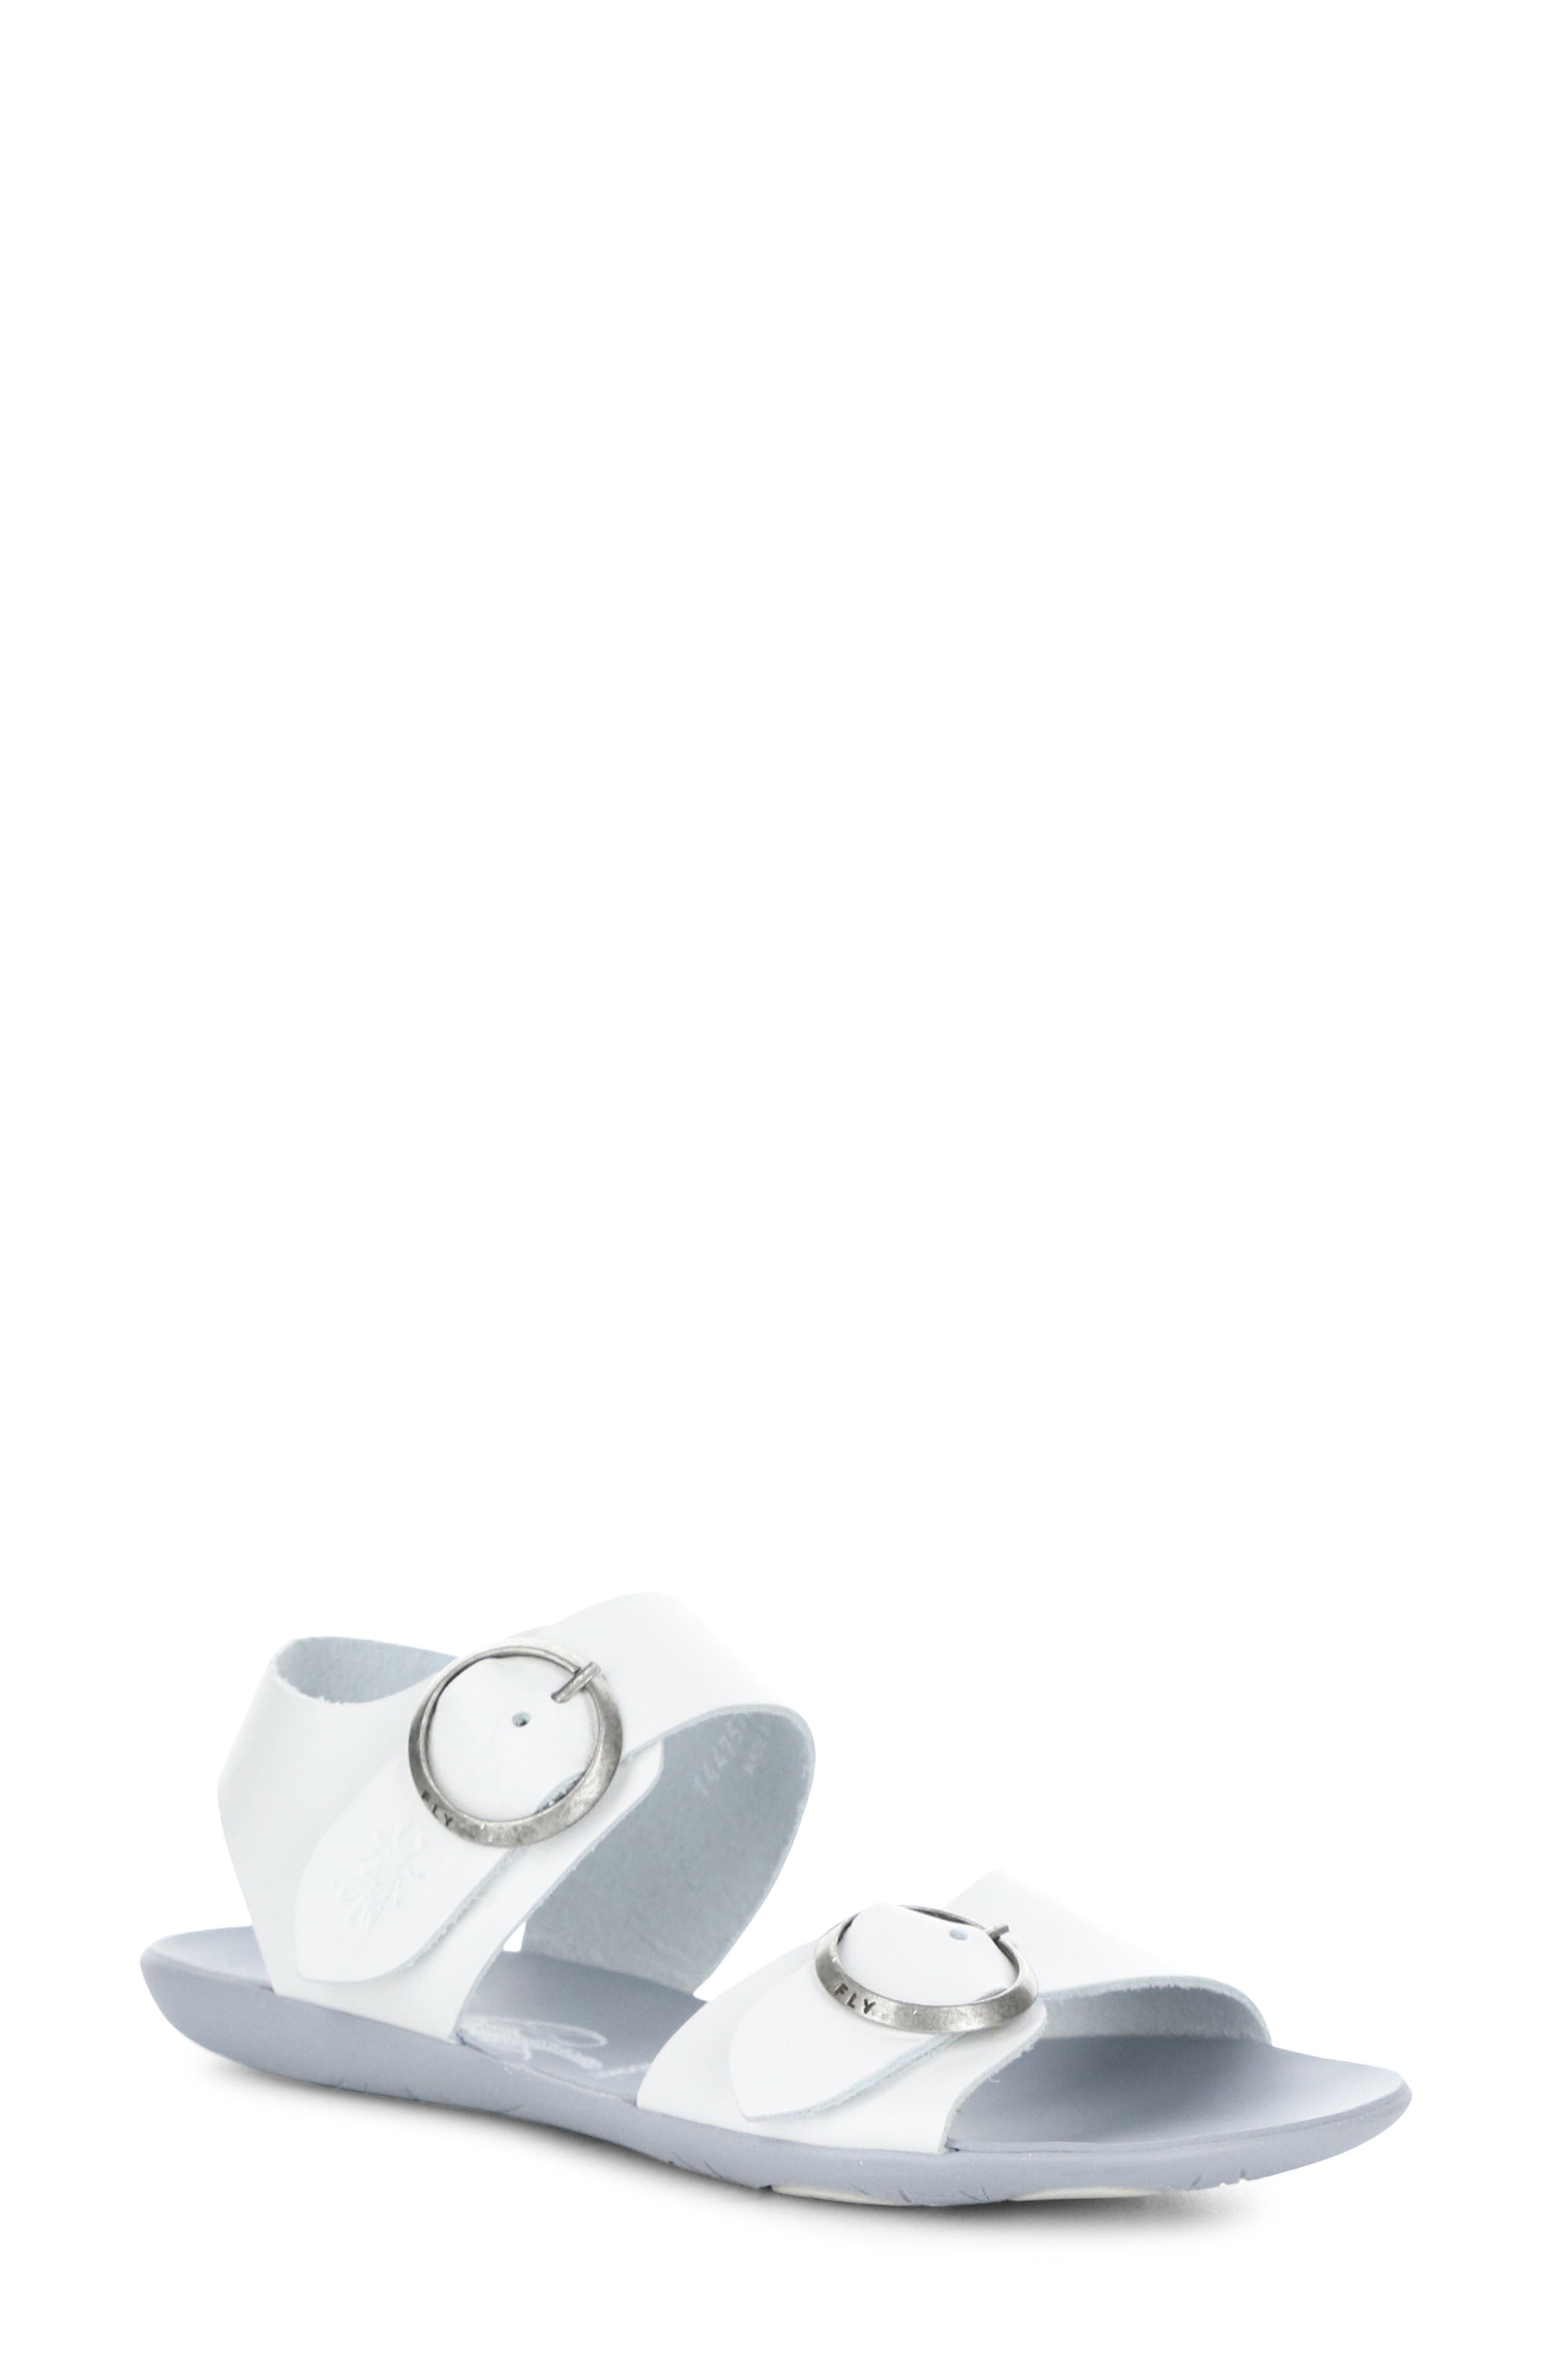 Masa Sandal